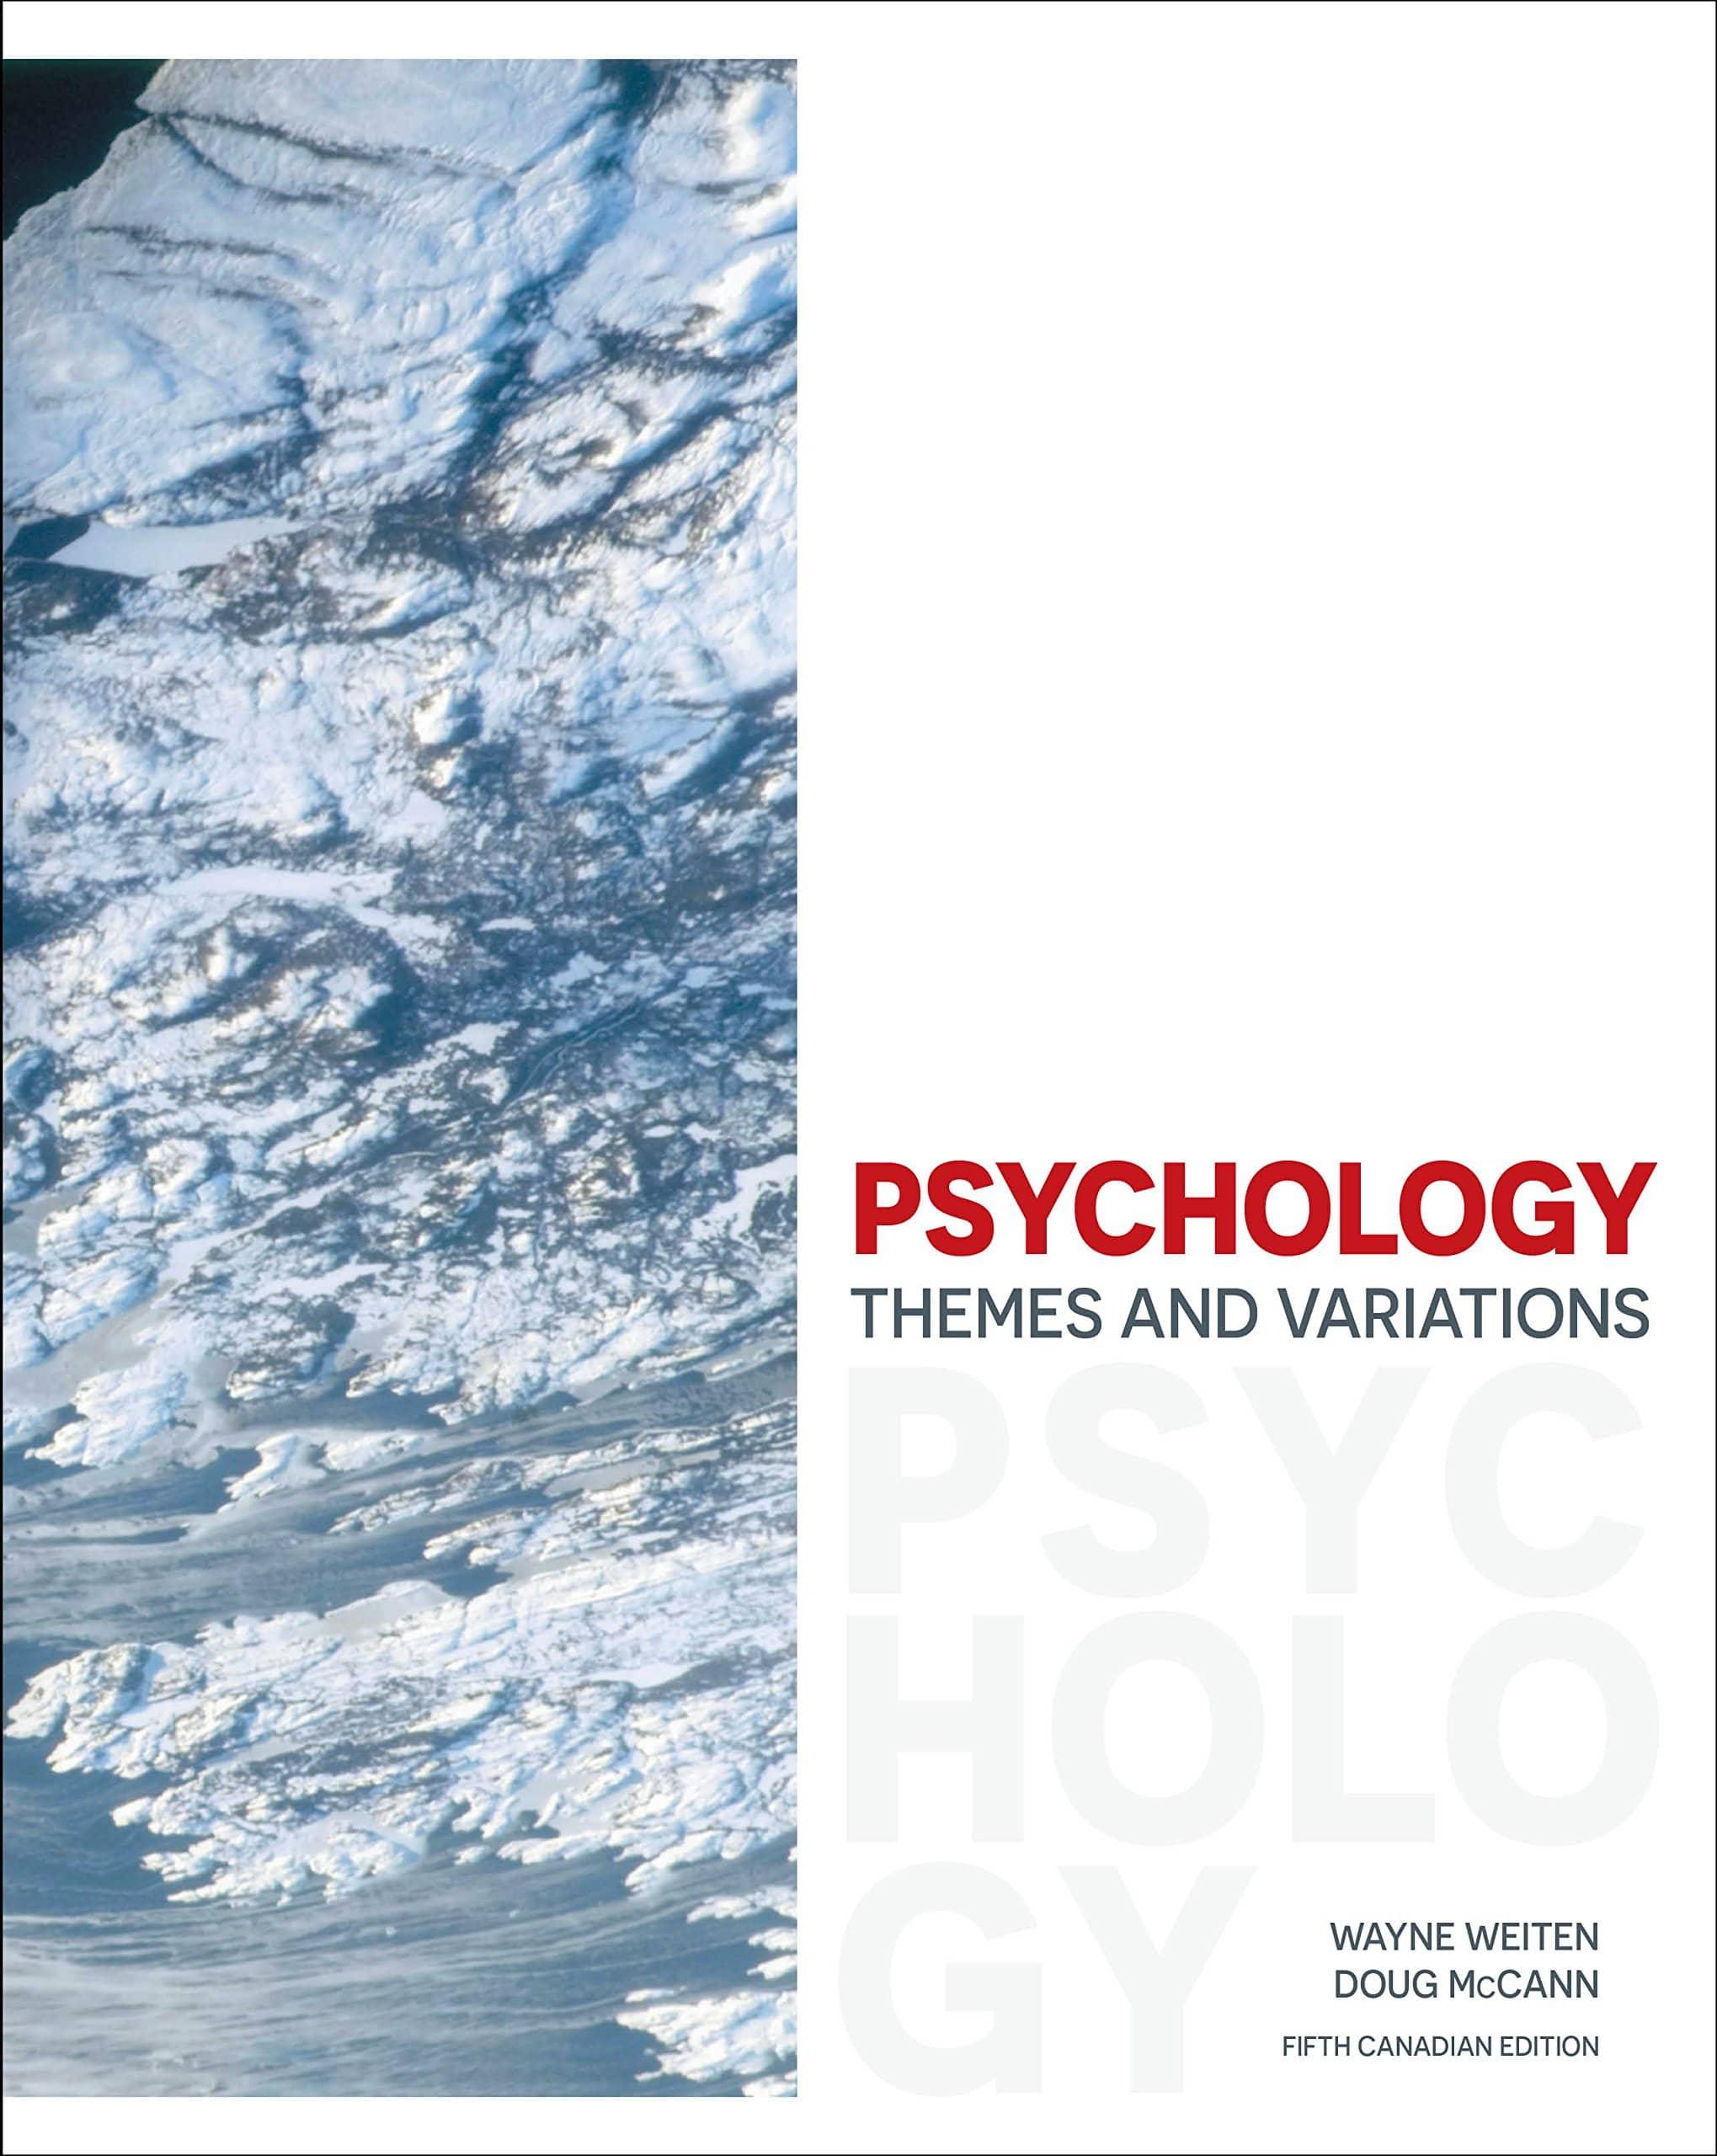 Psychology Themes and Variations, 5th Edition Wayne Weiten, Doug McCann Test Bank